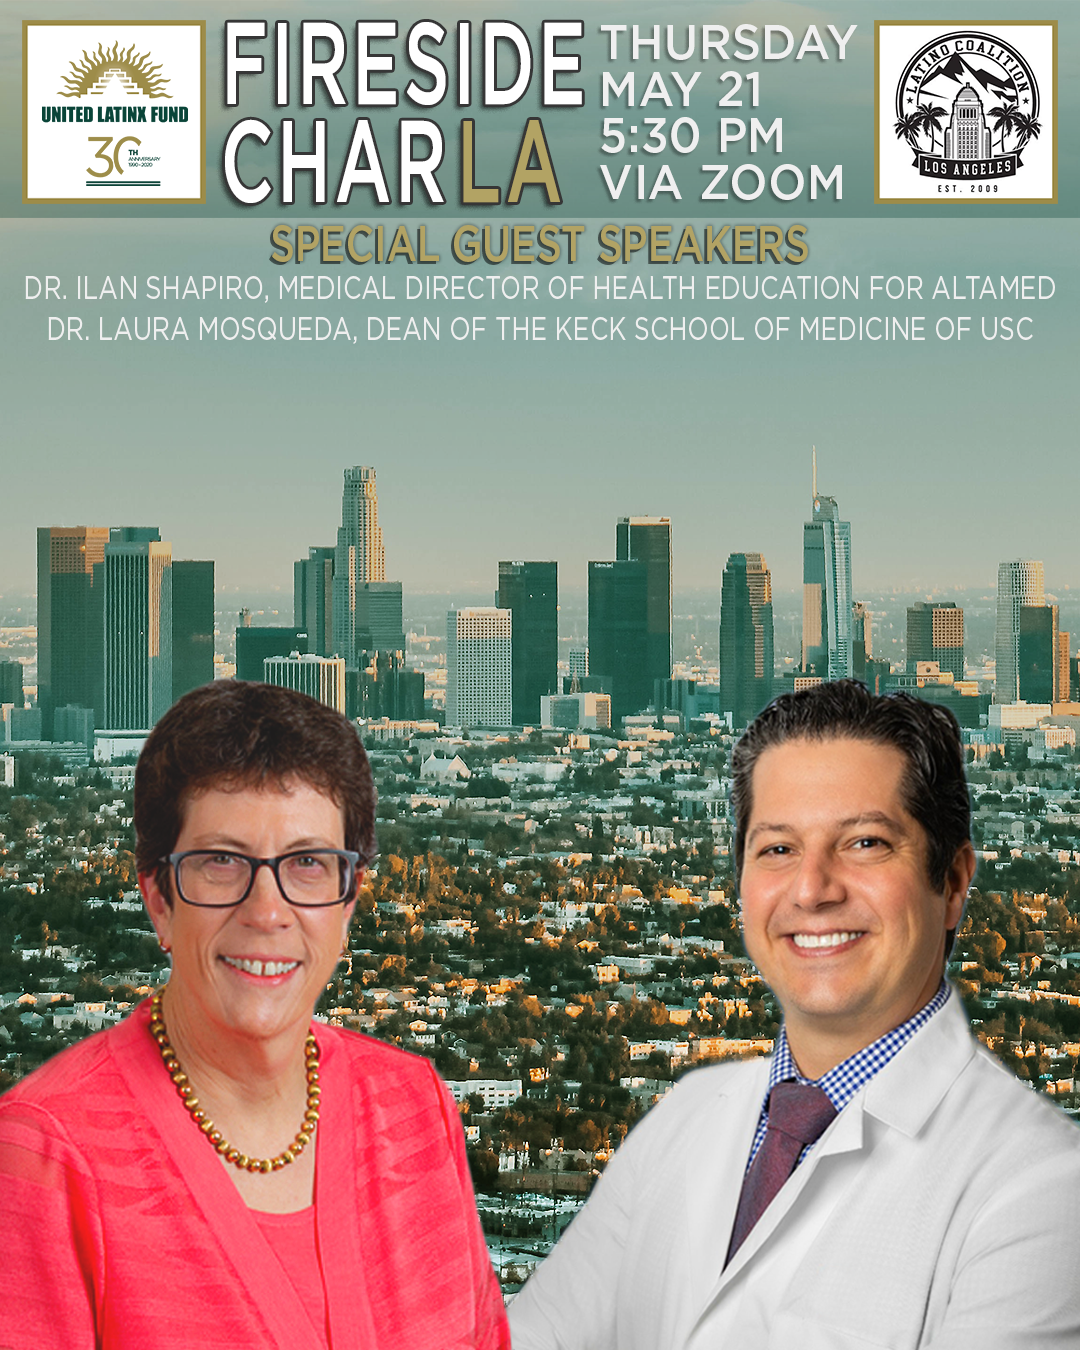 5/21/2020 Fireside CharLA - Featuring Dr. Laura Mosqueda & Dr. Ilan Shapiro